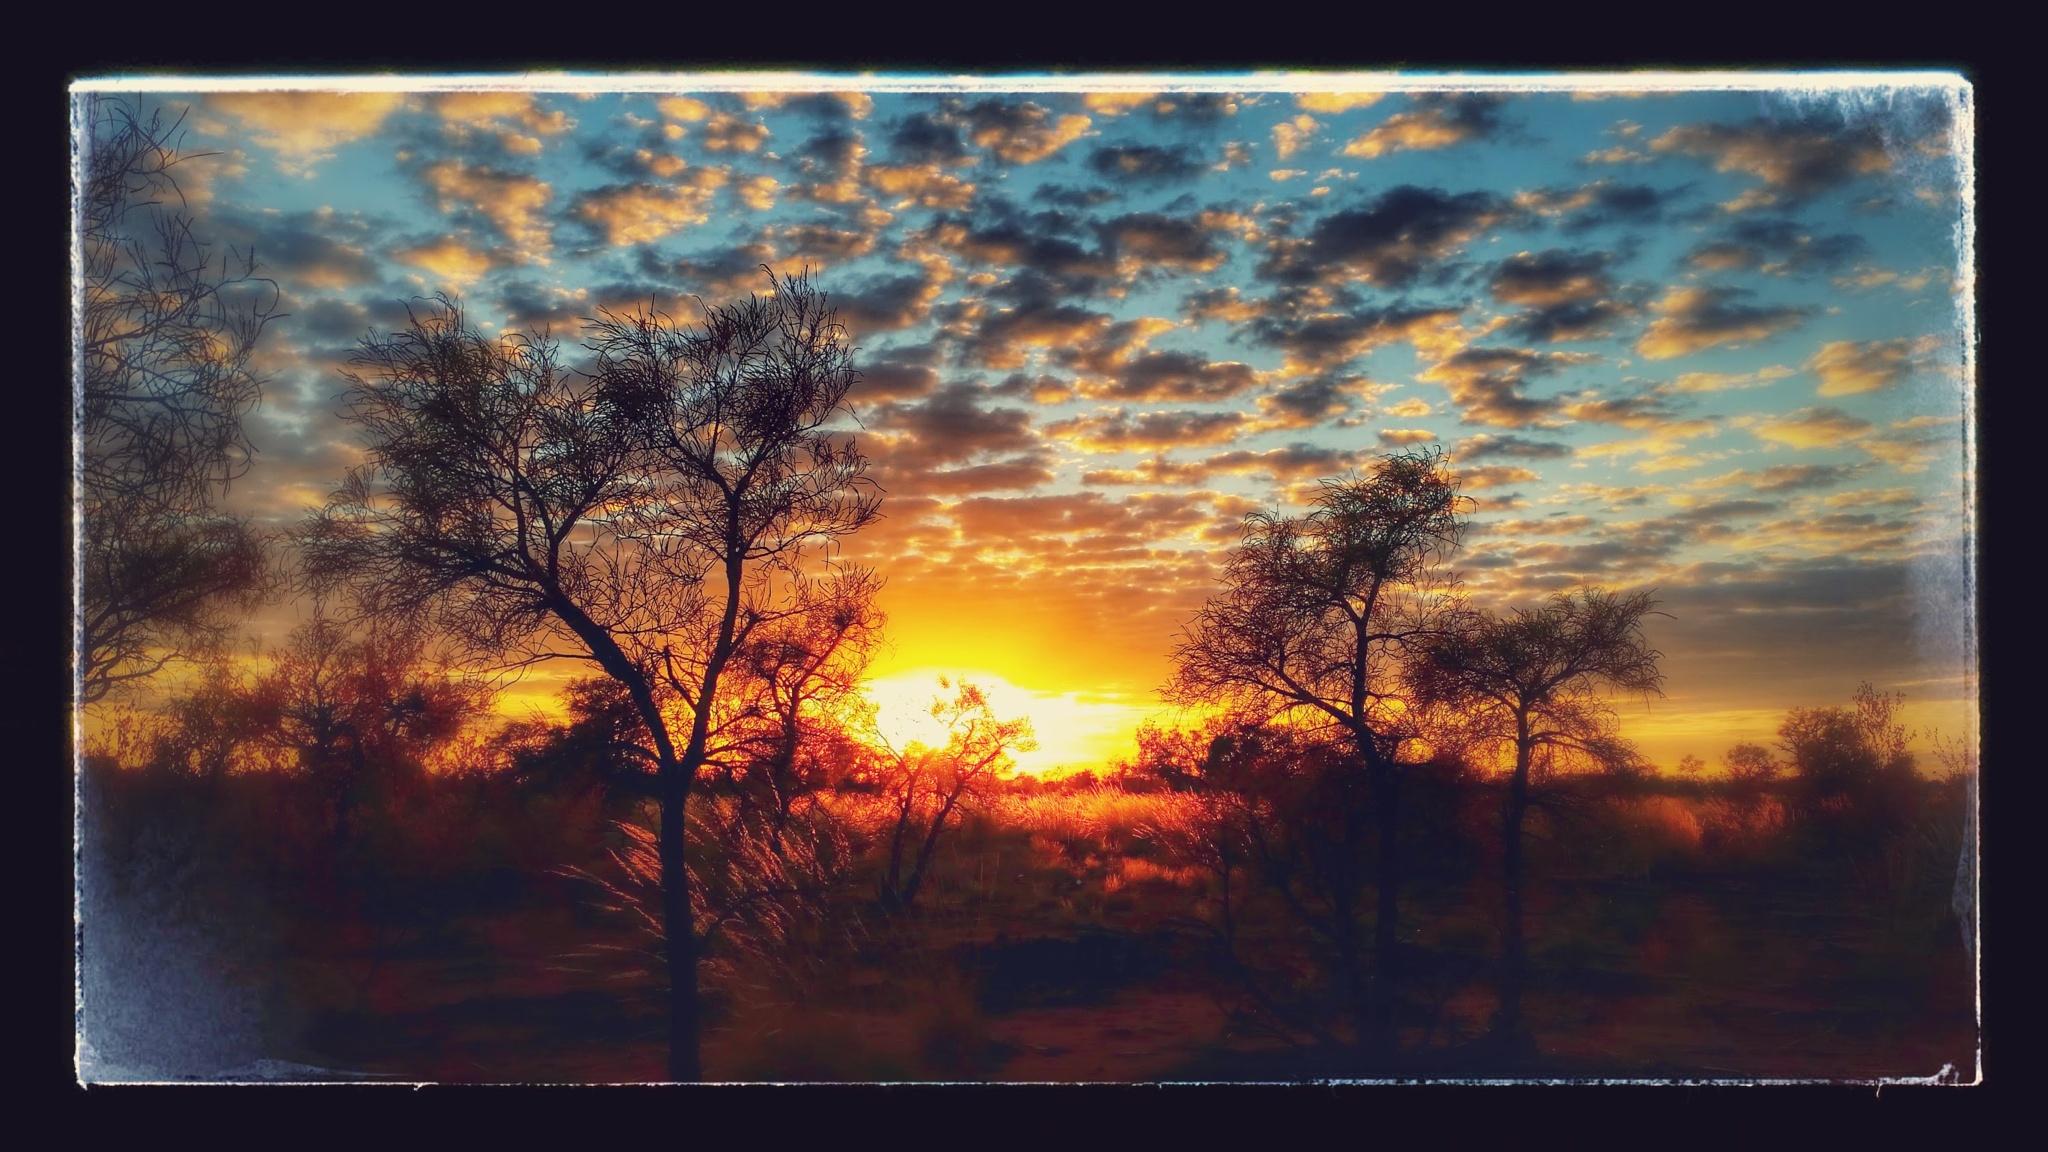 Tanami sunset enhanced by kiwikyla